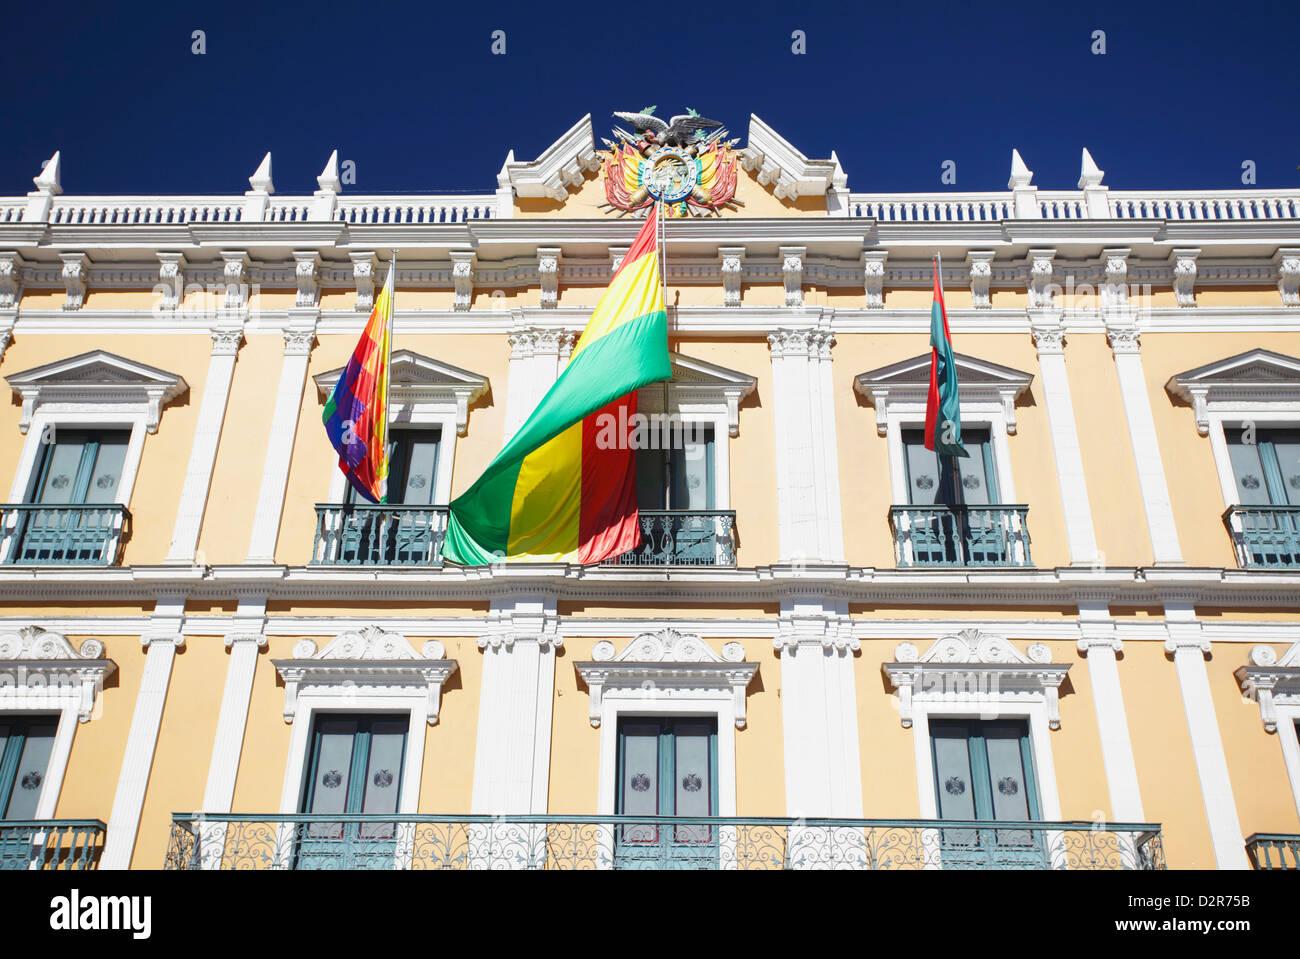 Palacio Presidencial (Presidential Palace) in Plaza Pedro Murillo, La Paz, Bolivia, South America - Stock Image